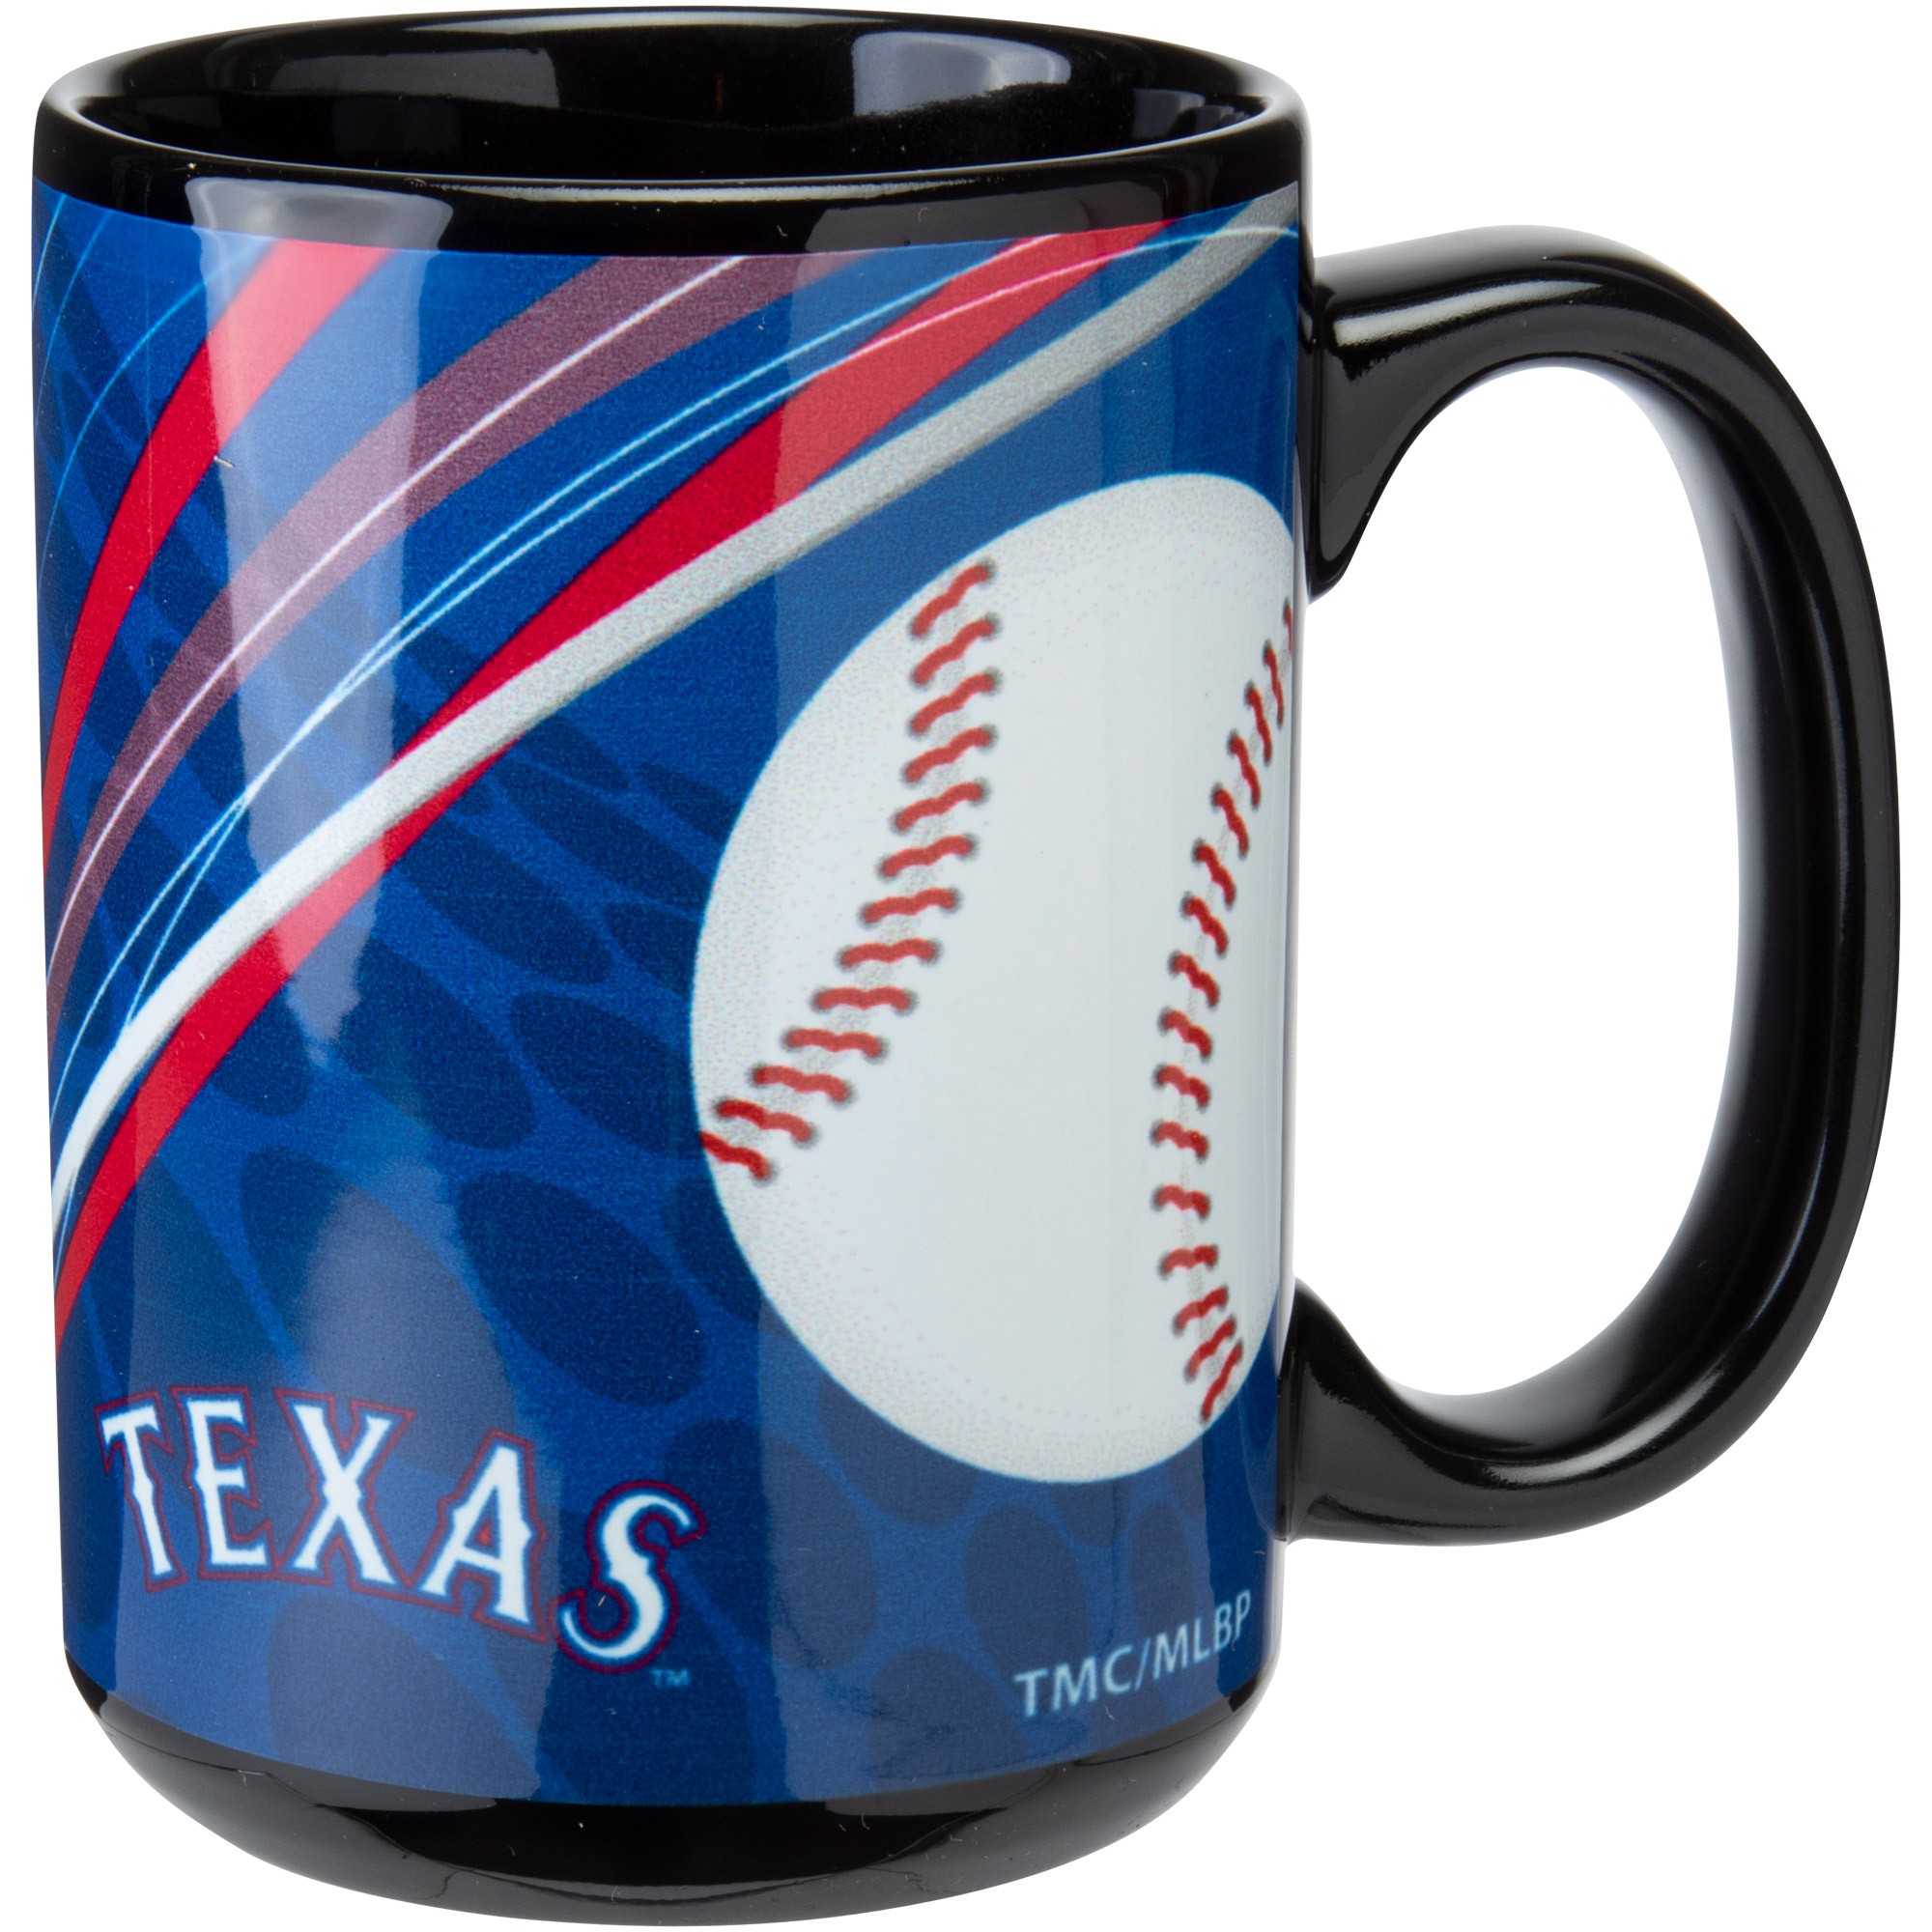 Texas Rangers 15oz. Dynamic Mug - No Size